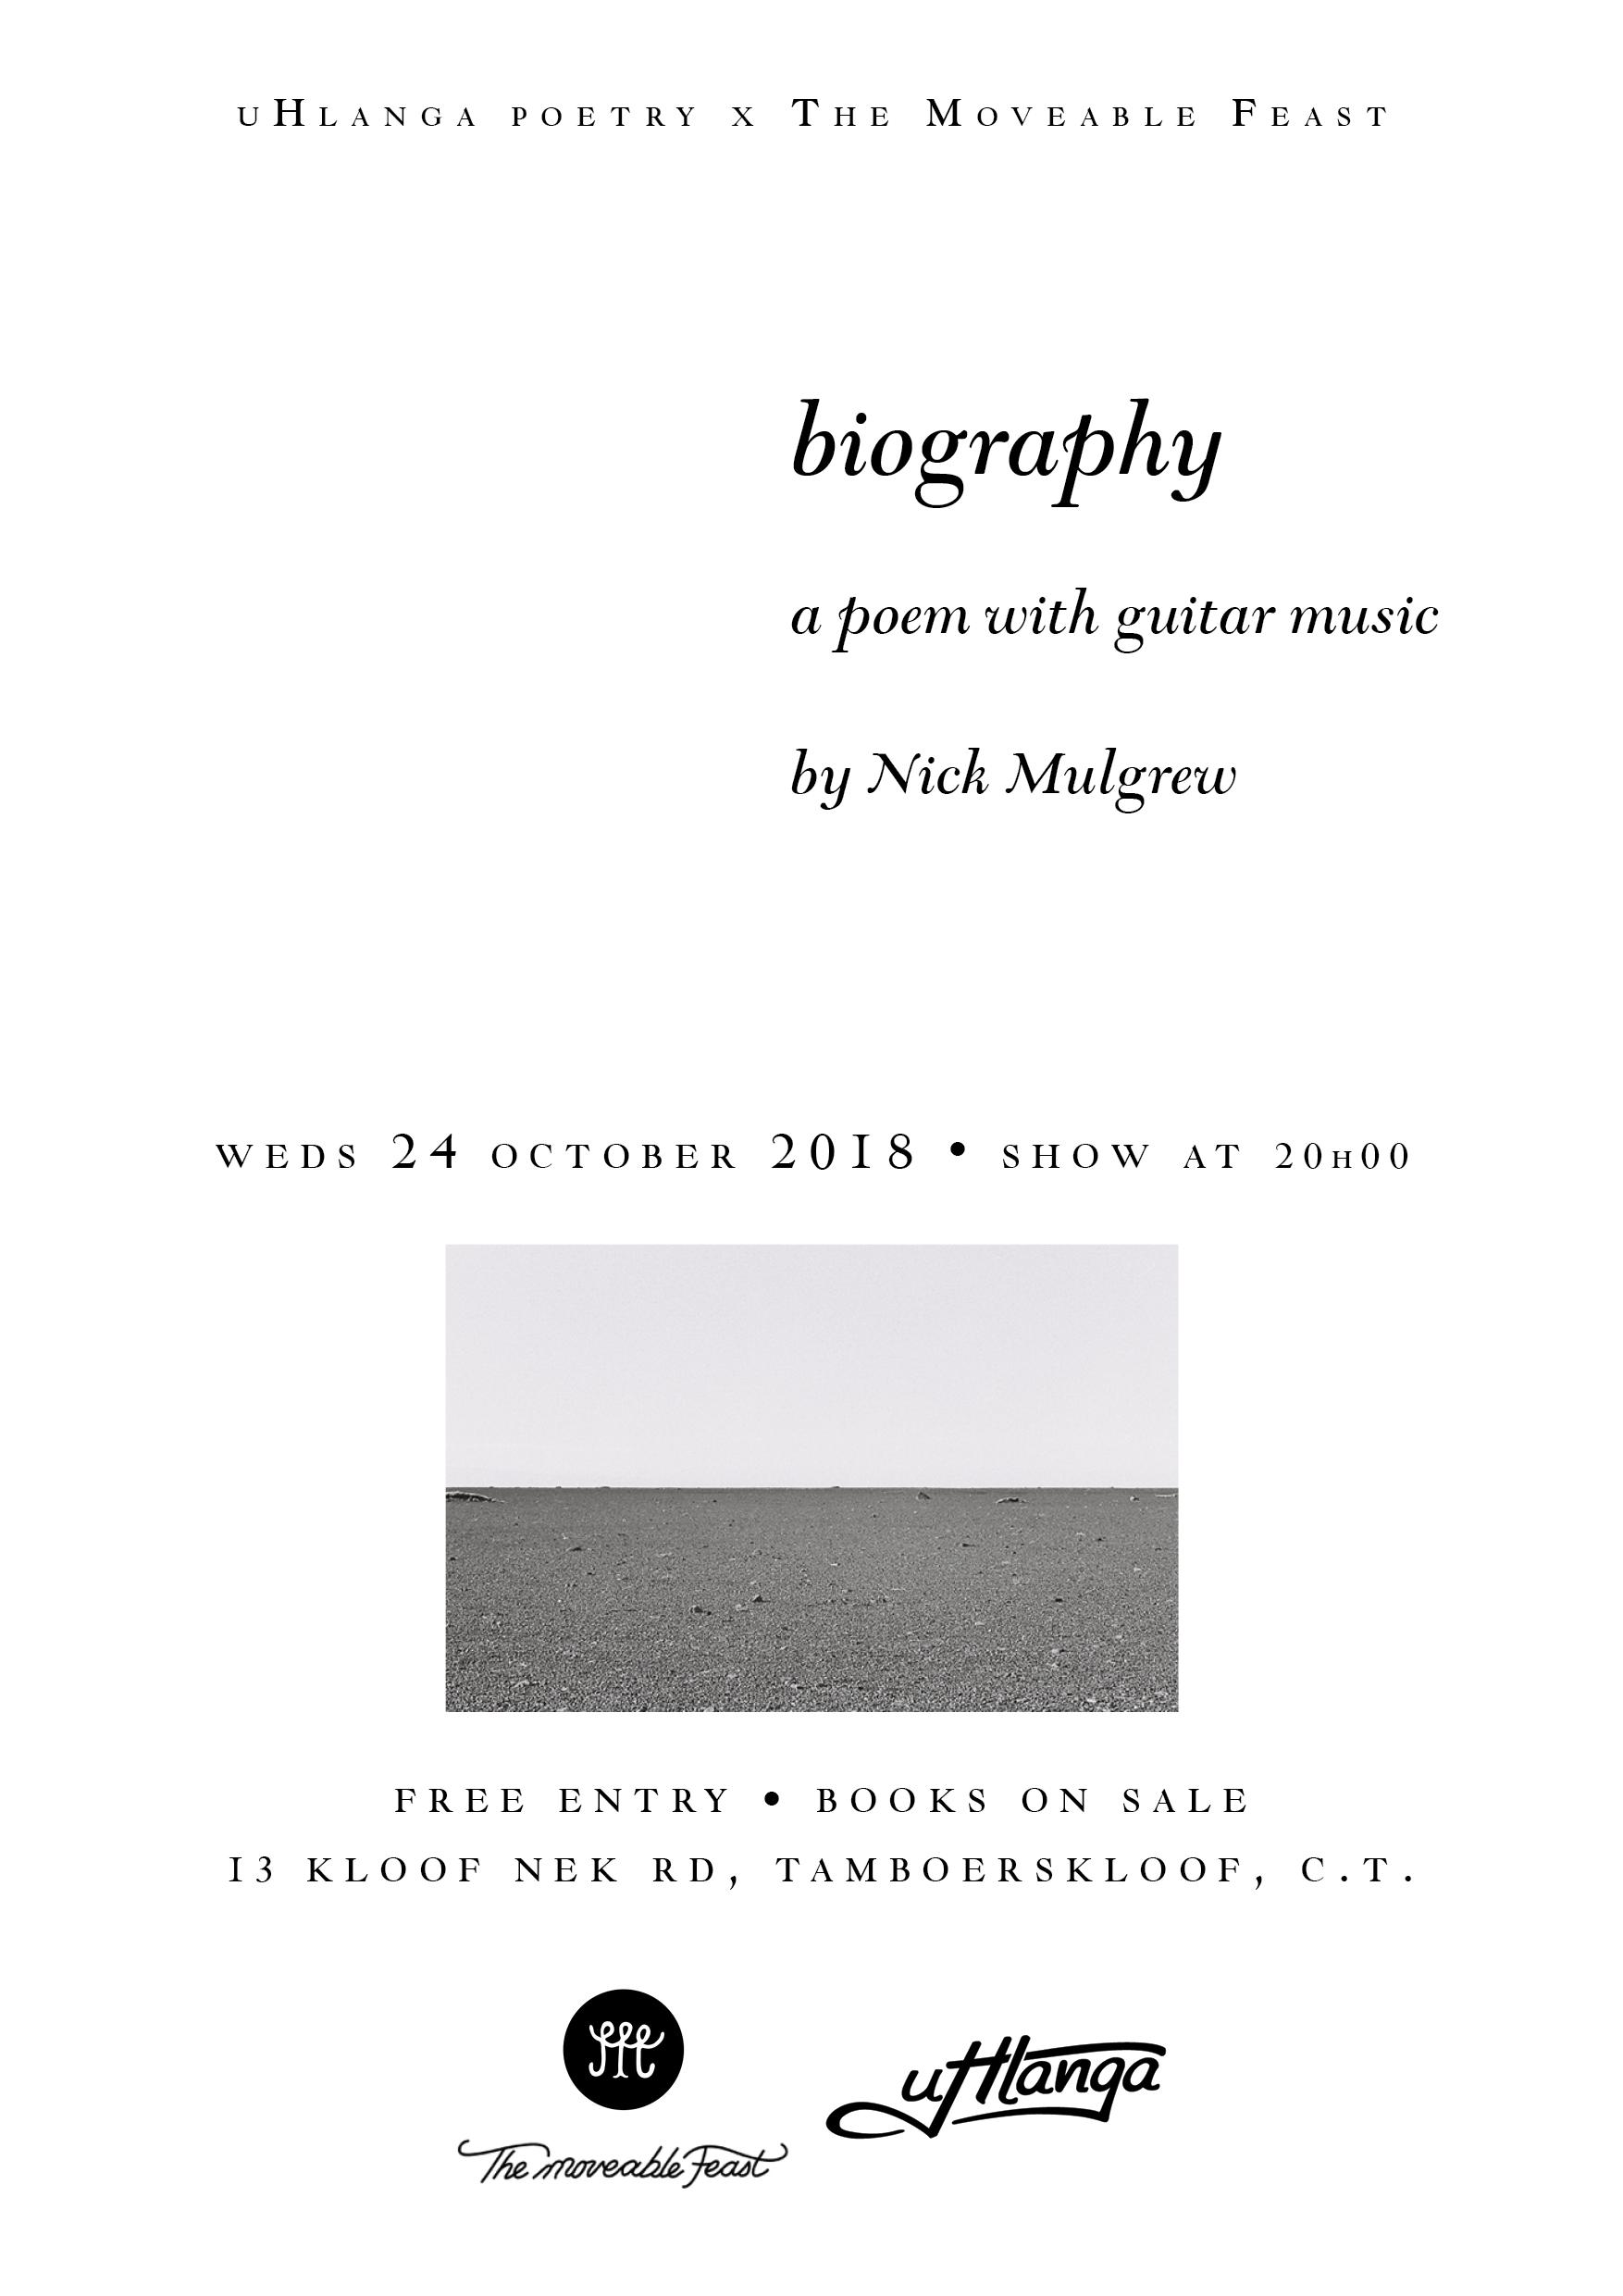 biography_tmf_20180928.png